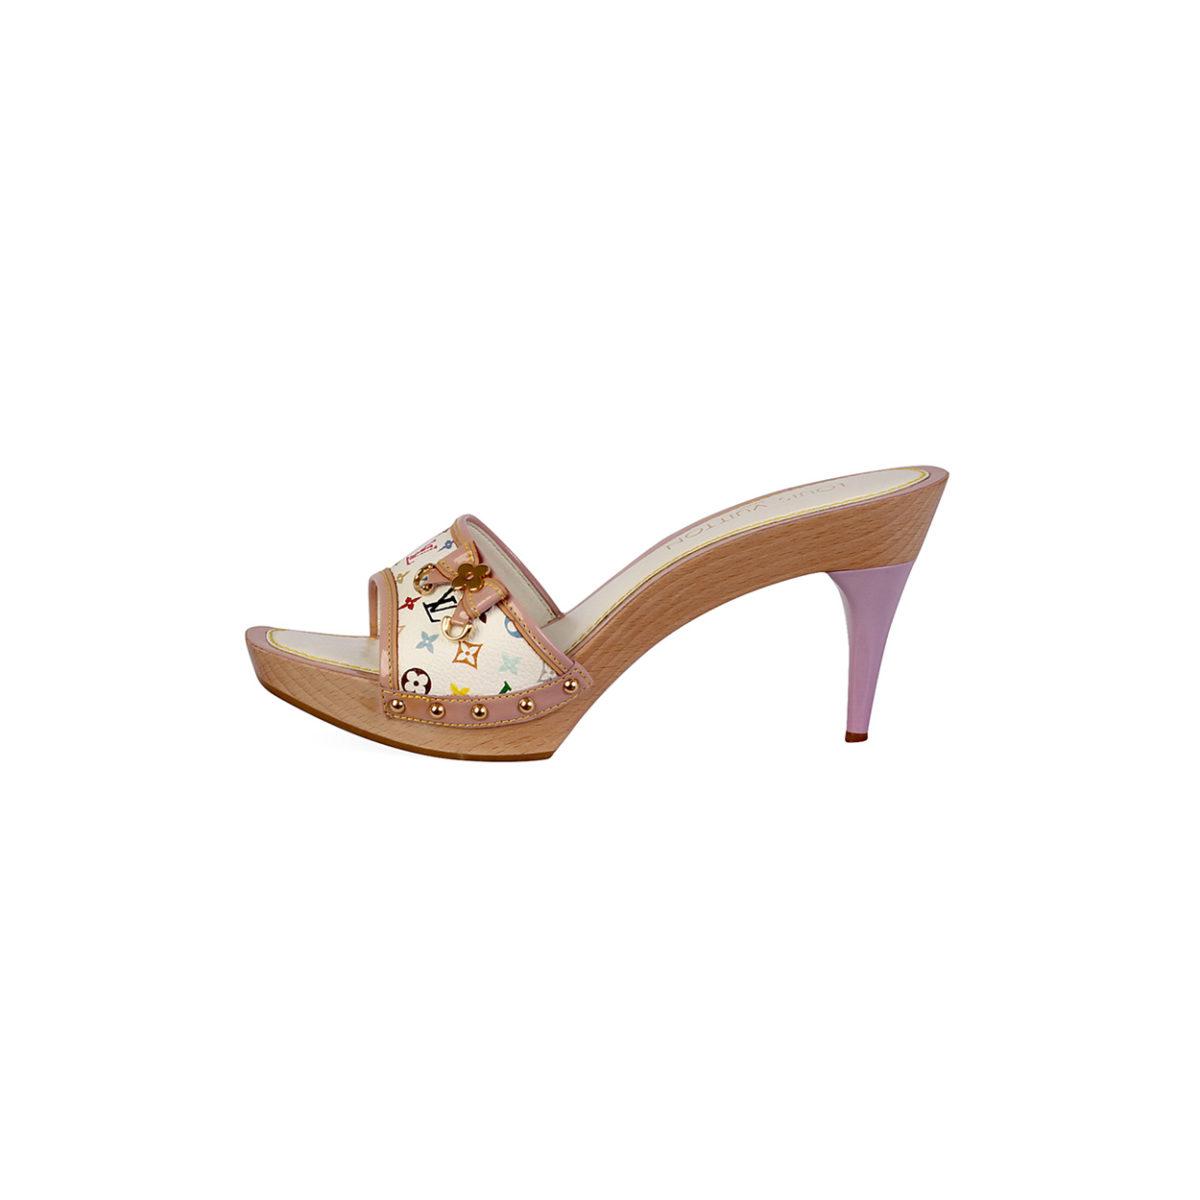 louis vuitton sandals price in rands